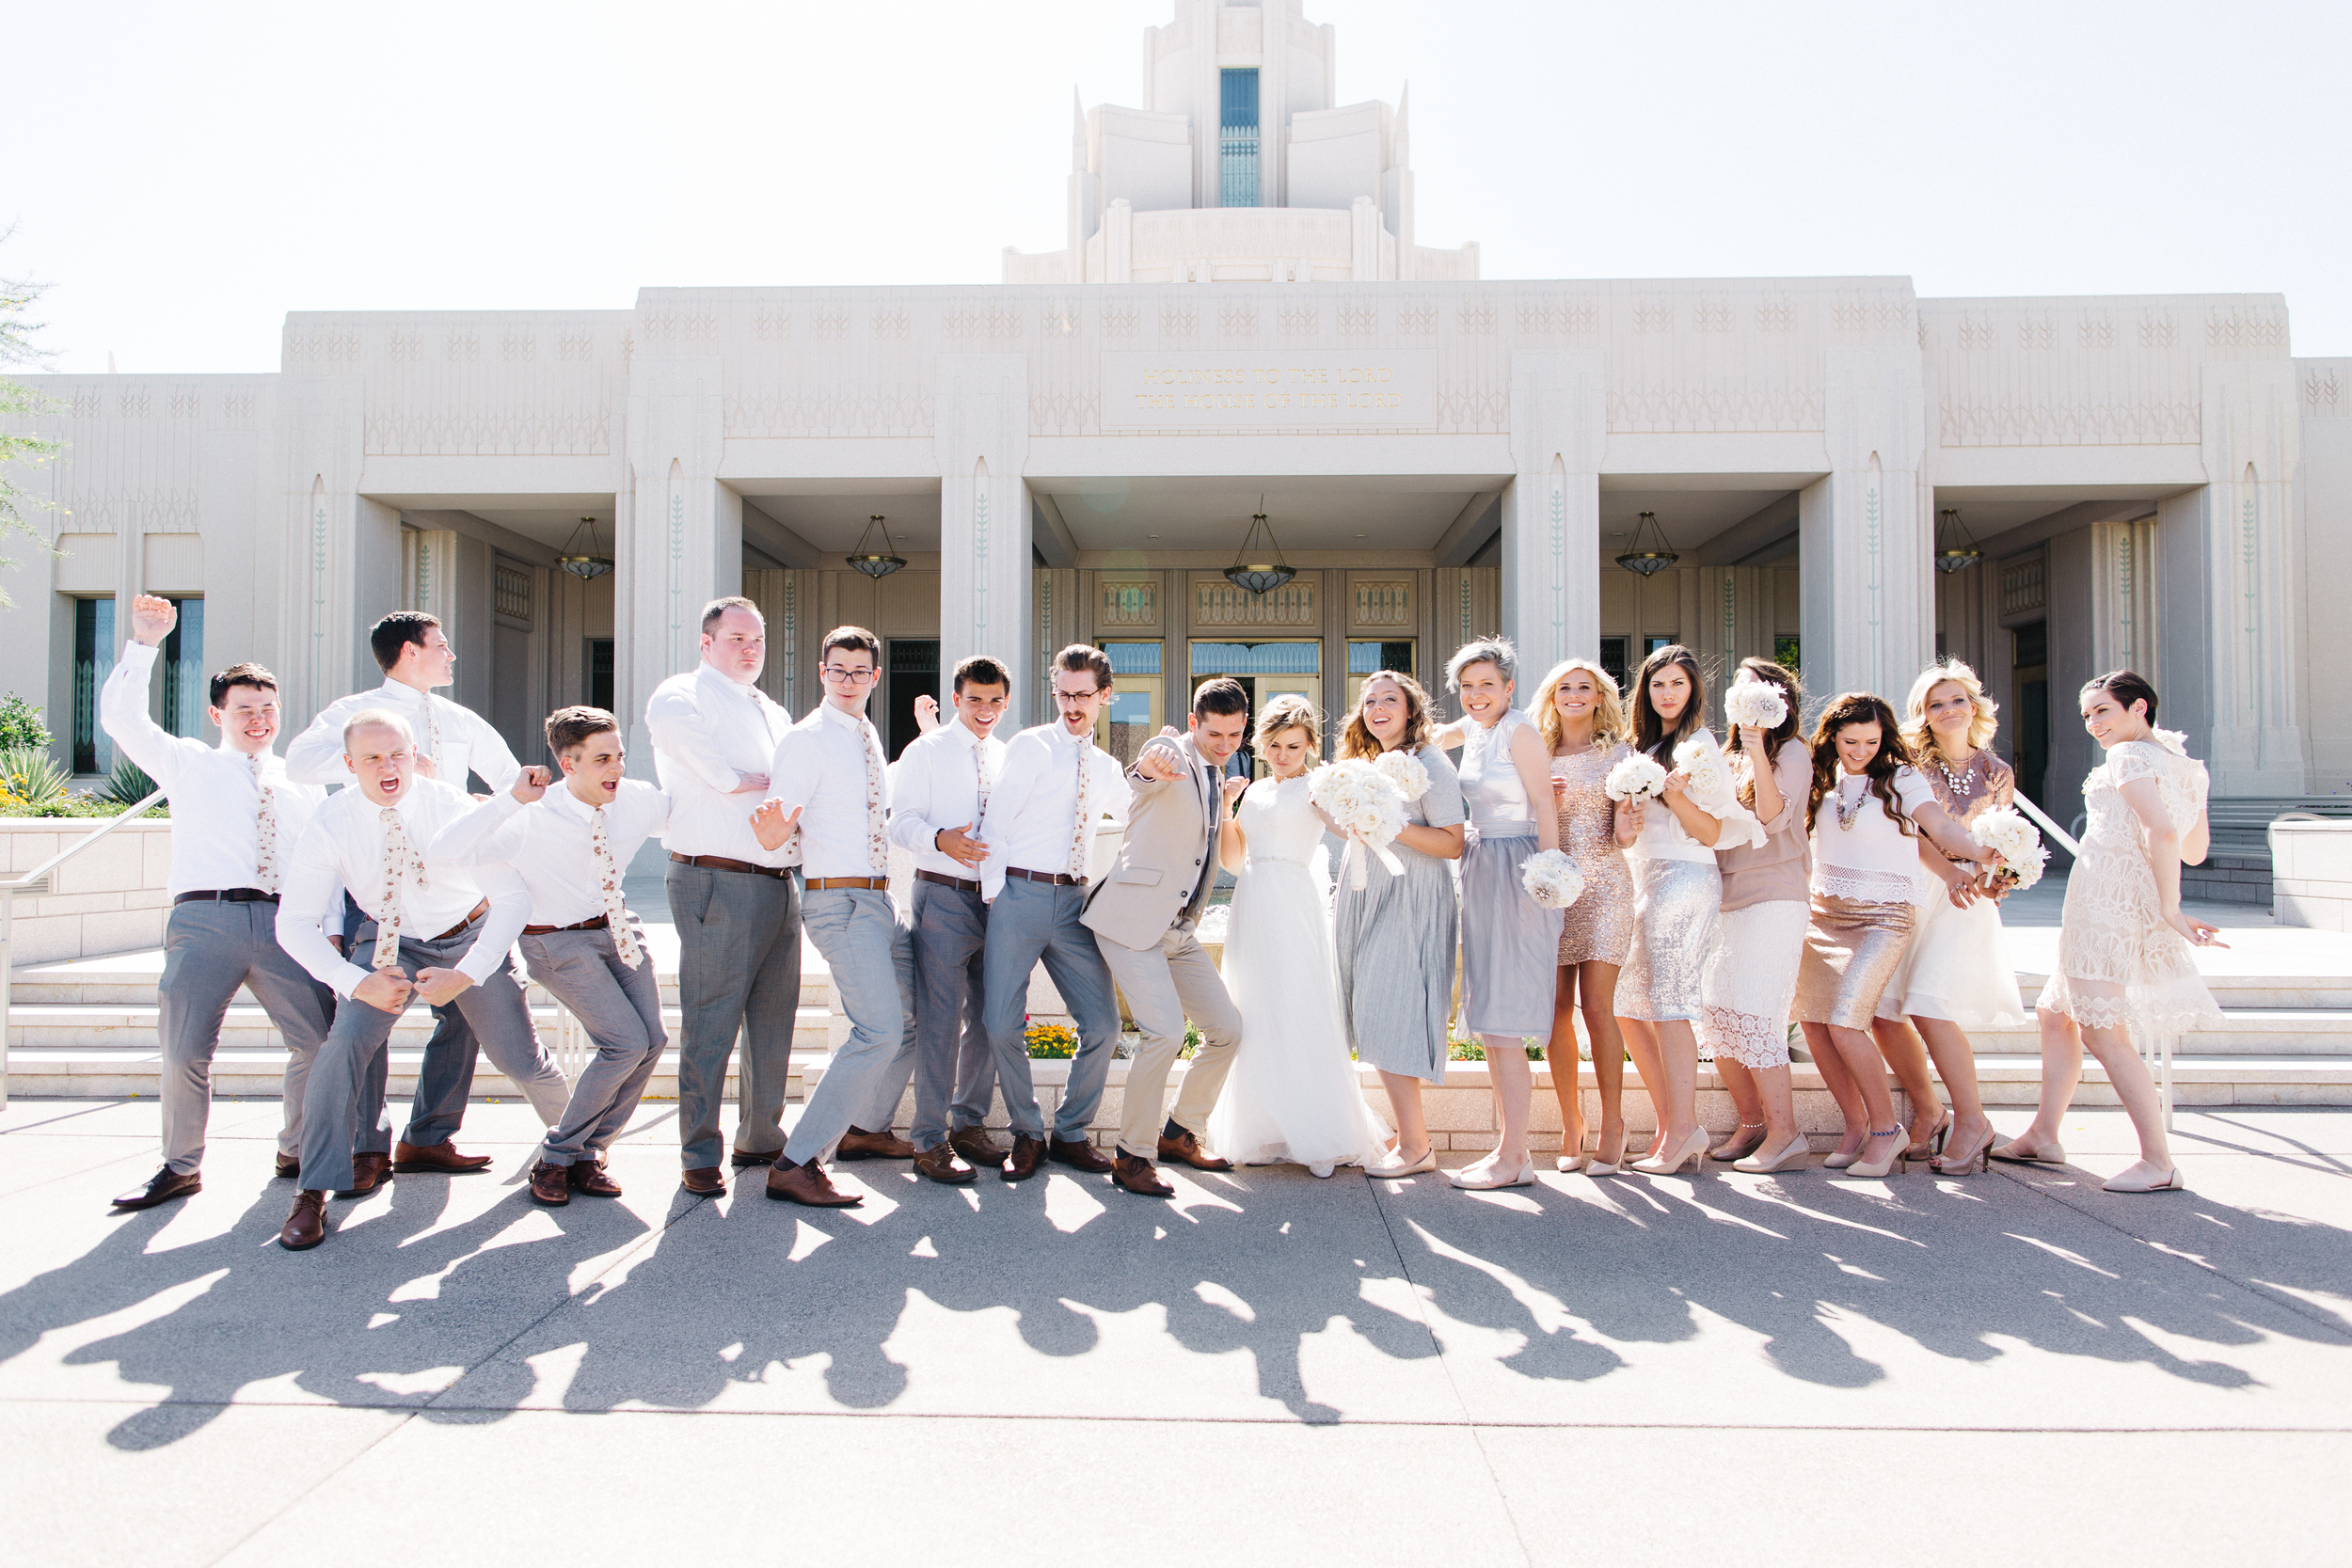 KennedyWyatt_WeddingDay-61.jpg